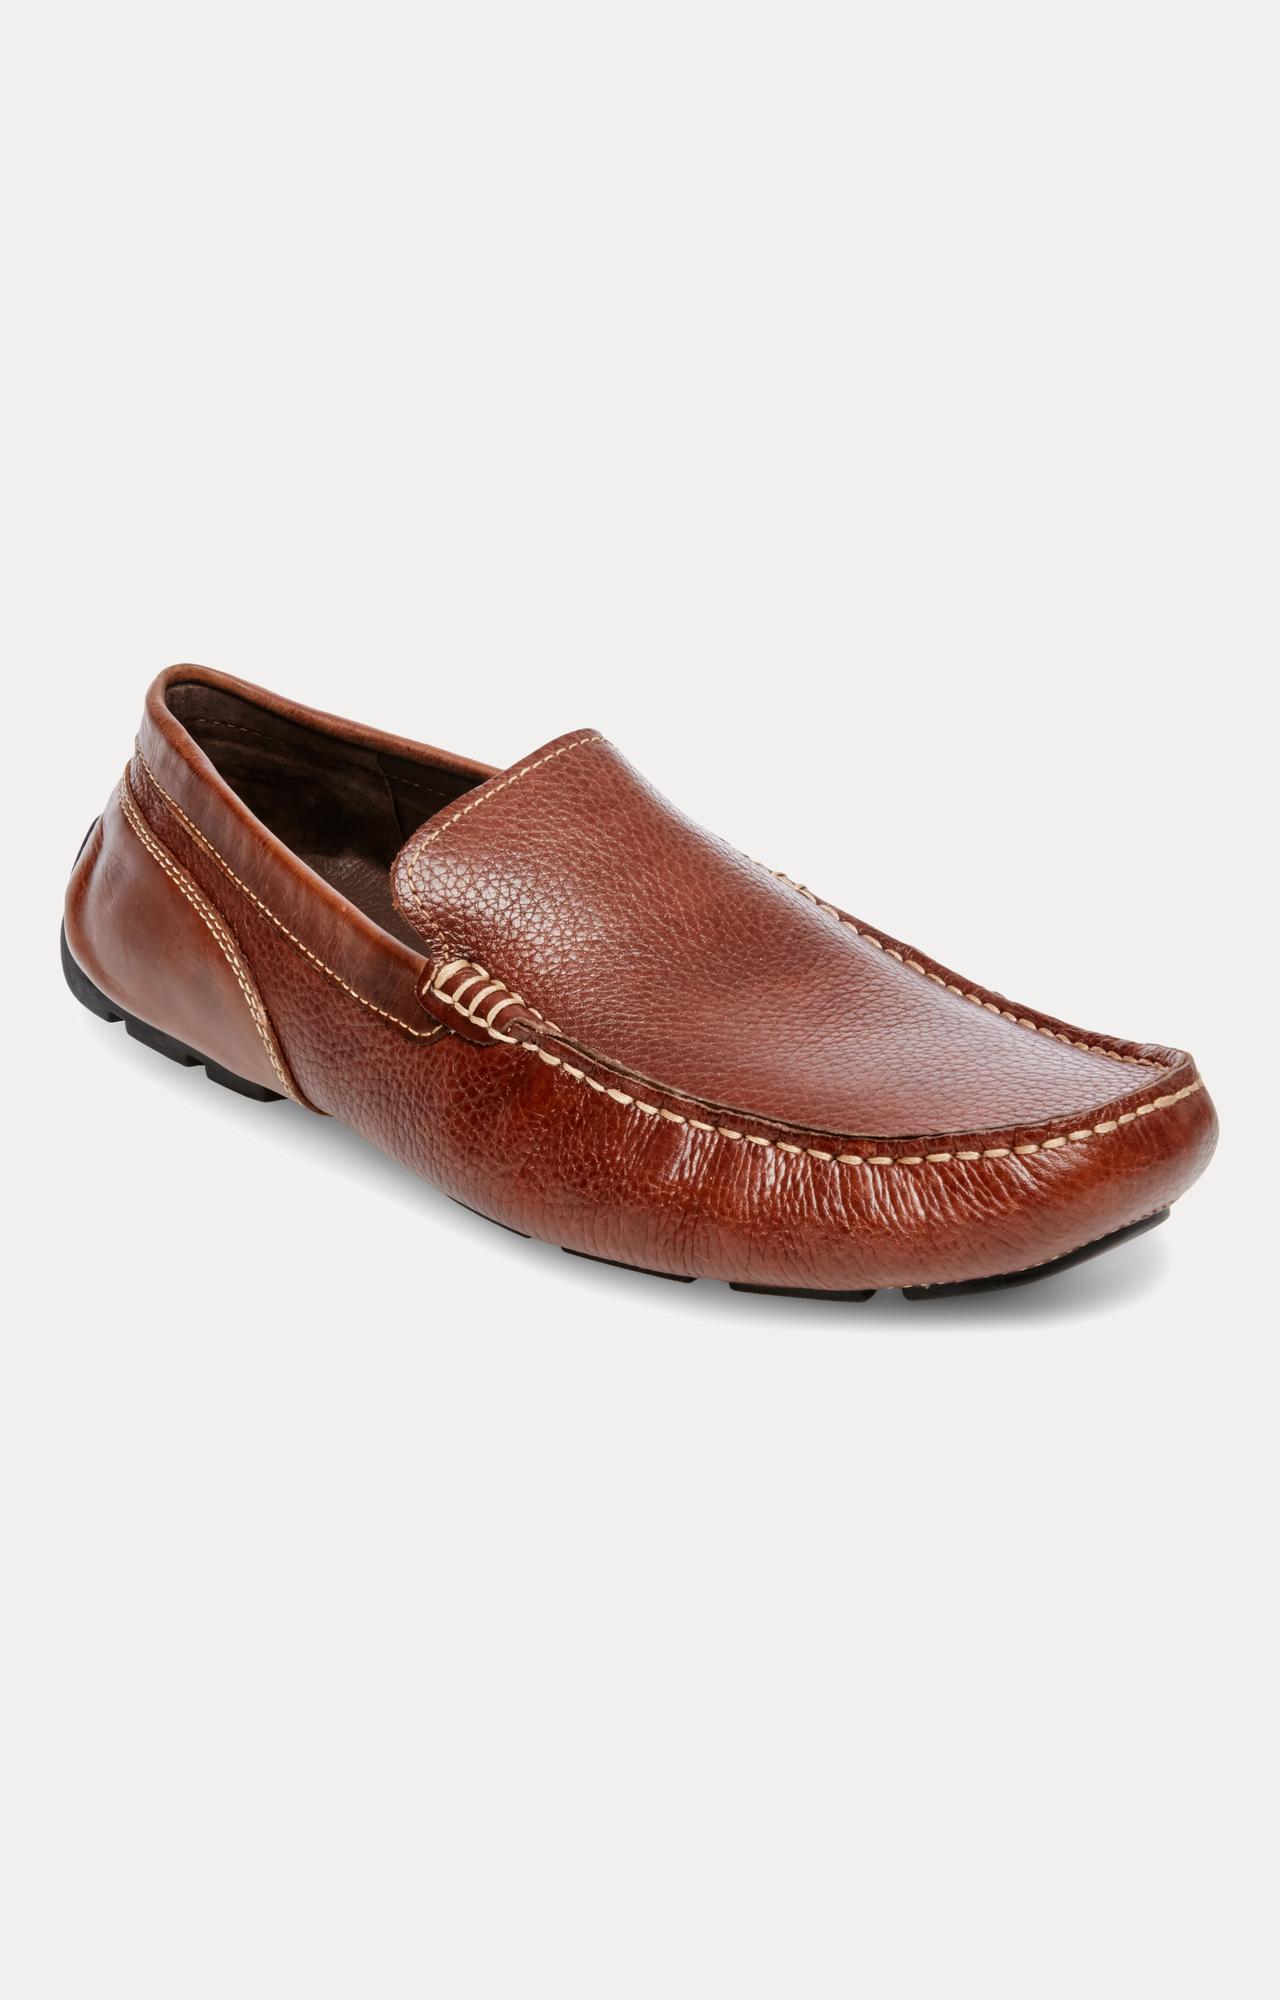 STEVE MADDEN | Dark Brown Loafers